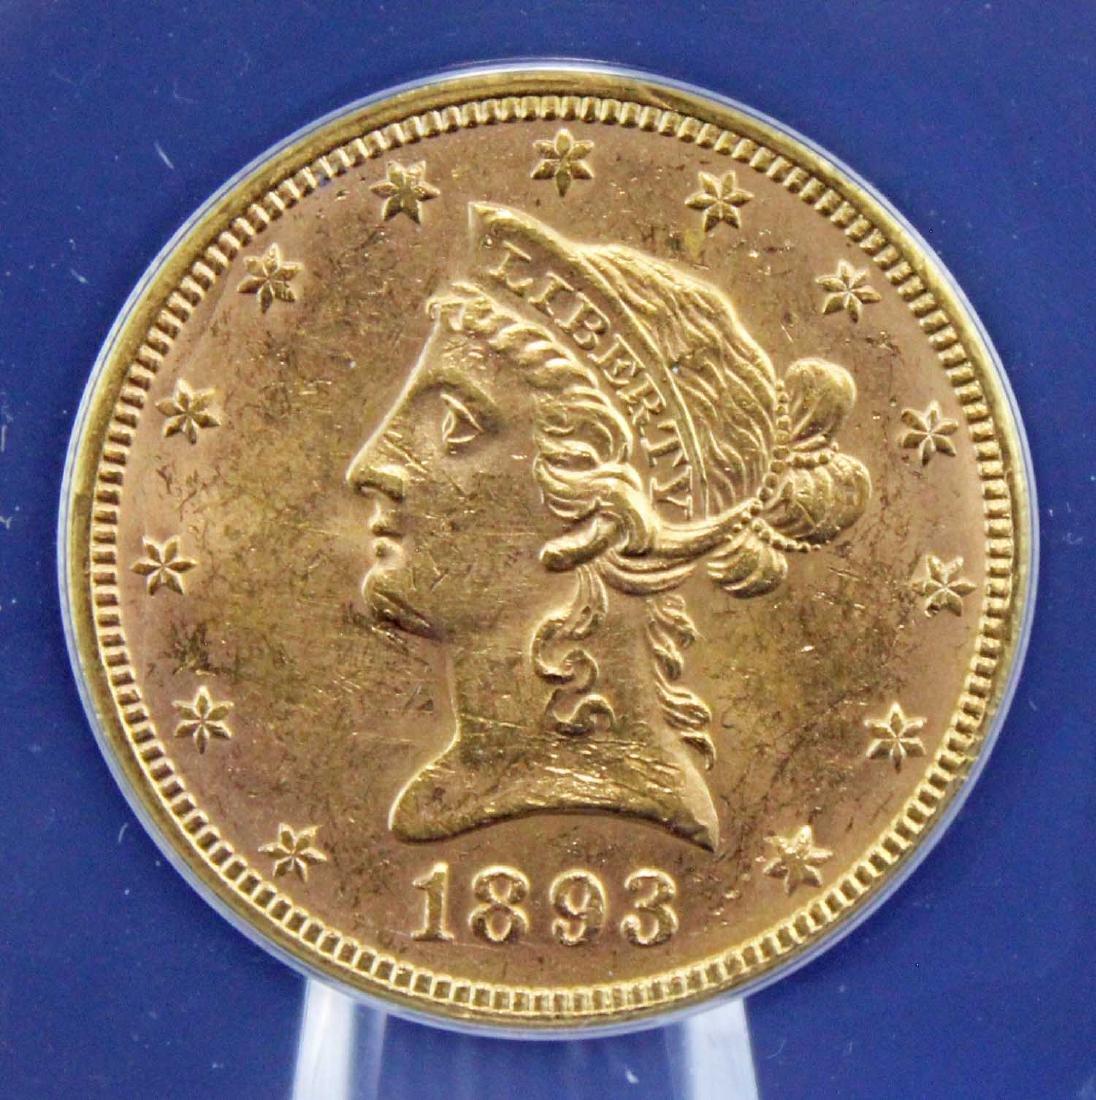 1893 $10 Liberty Head Gold Coin ANACS Graded MS 61 - 2